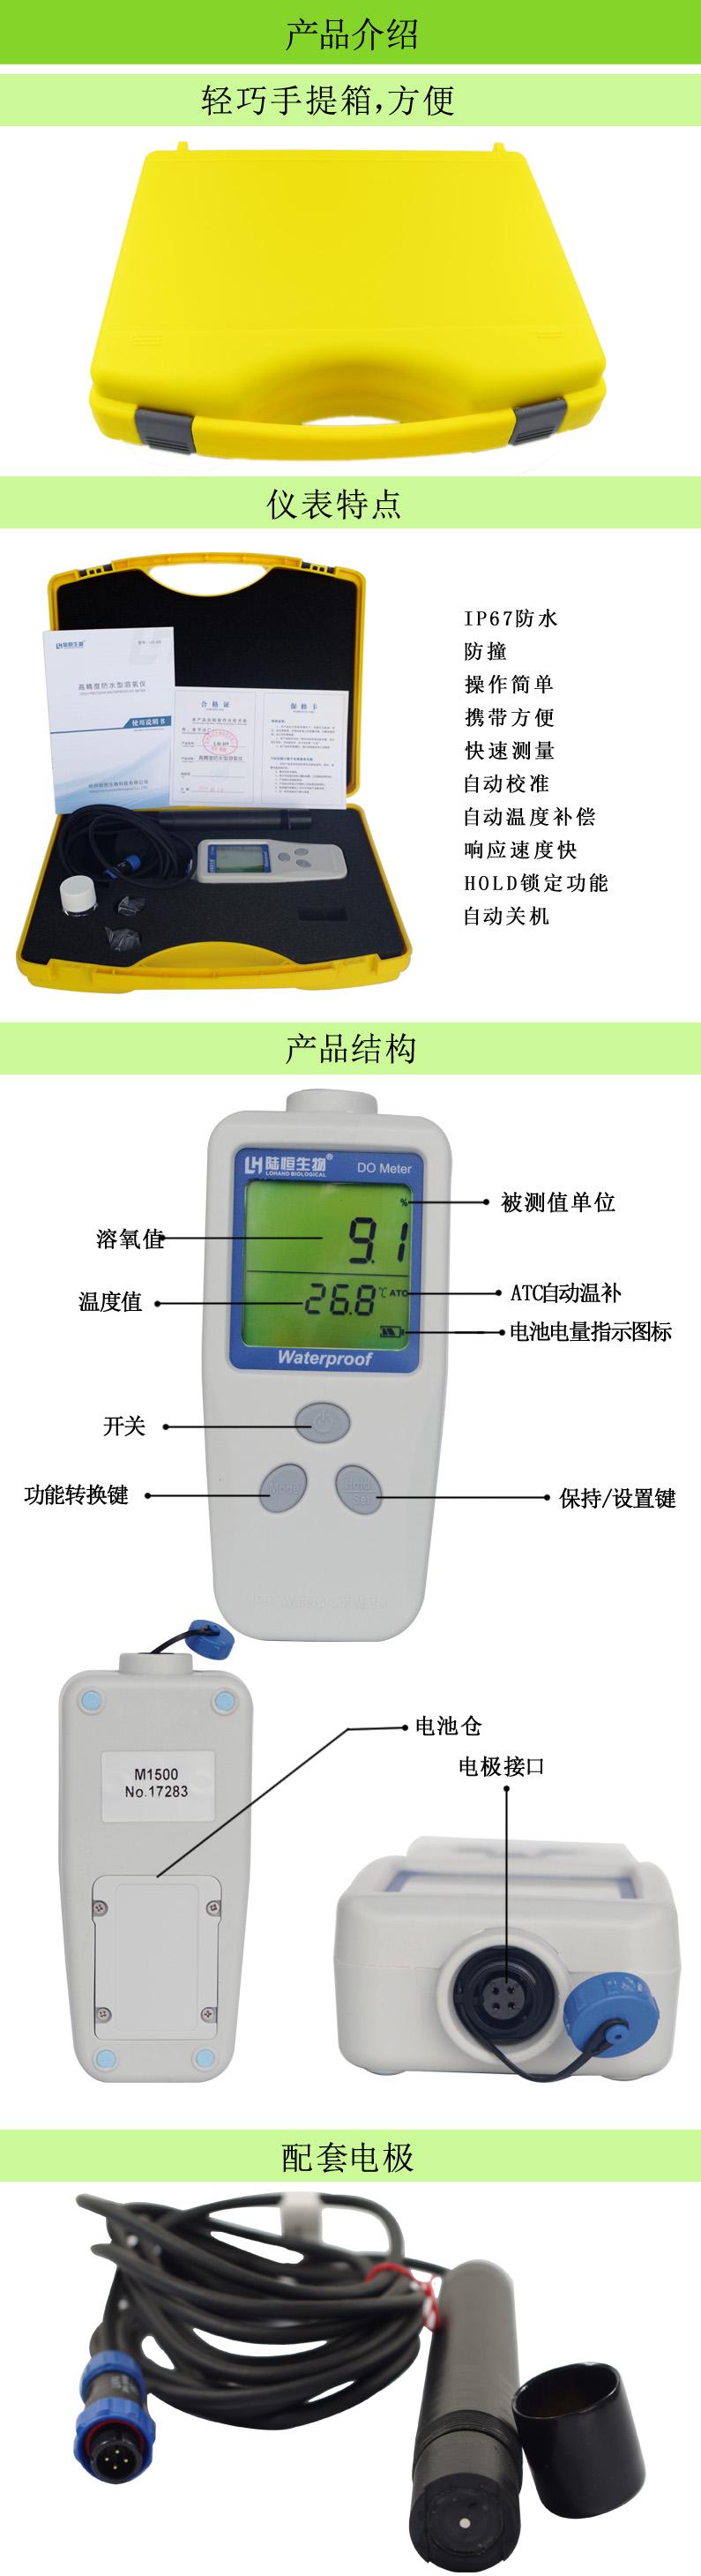 LH-D9 便携式溶解氧检测仪 水中氧浓度检测仪 溶解氧检测仪,便携式溶解氧检测仪,氧浓度检测仪,氧含量检测仪,便携式溶解氧测定仪